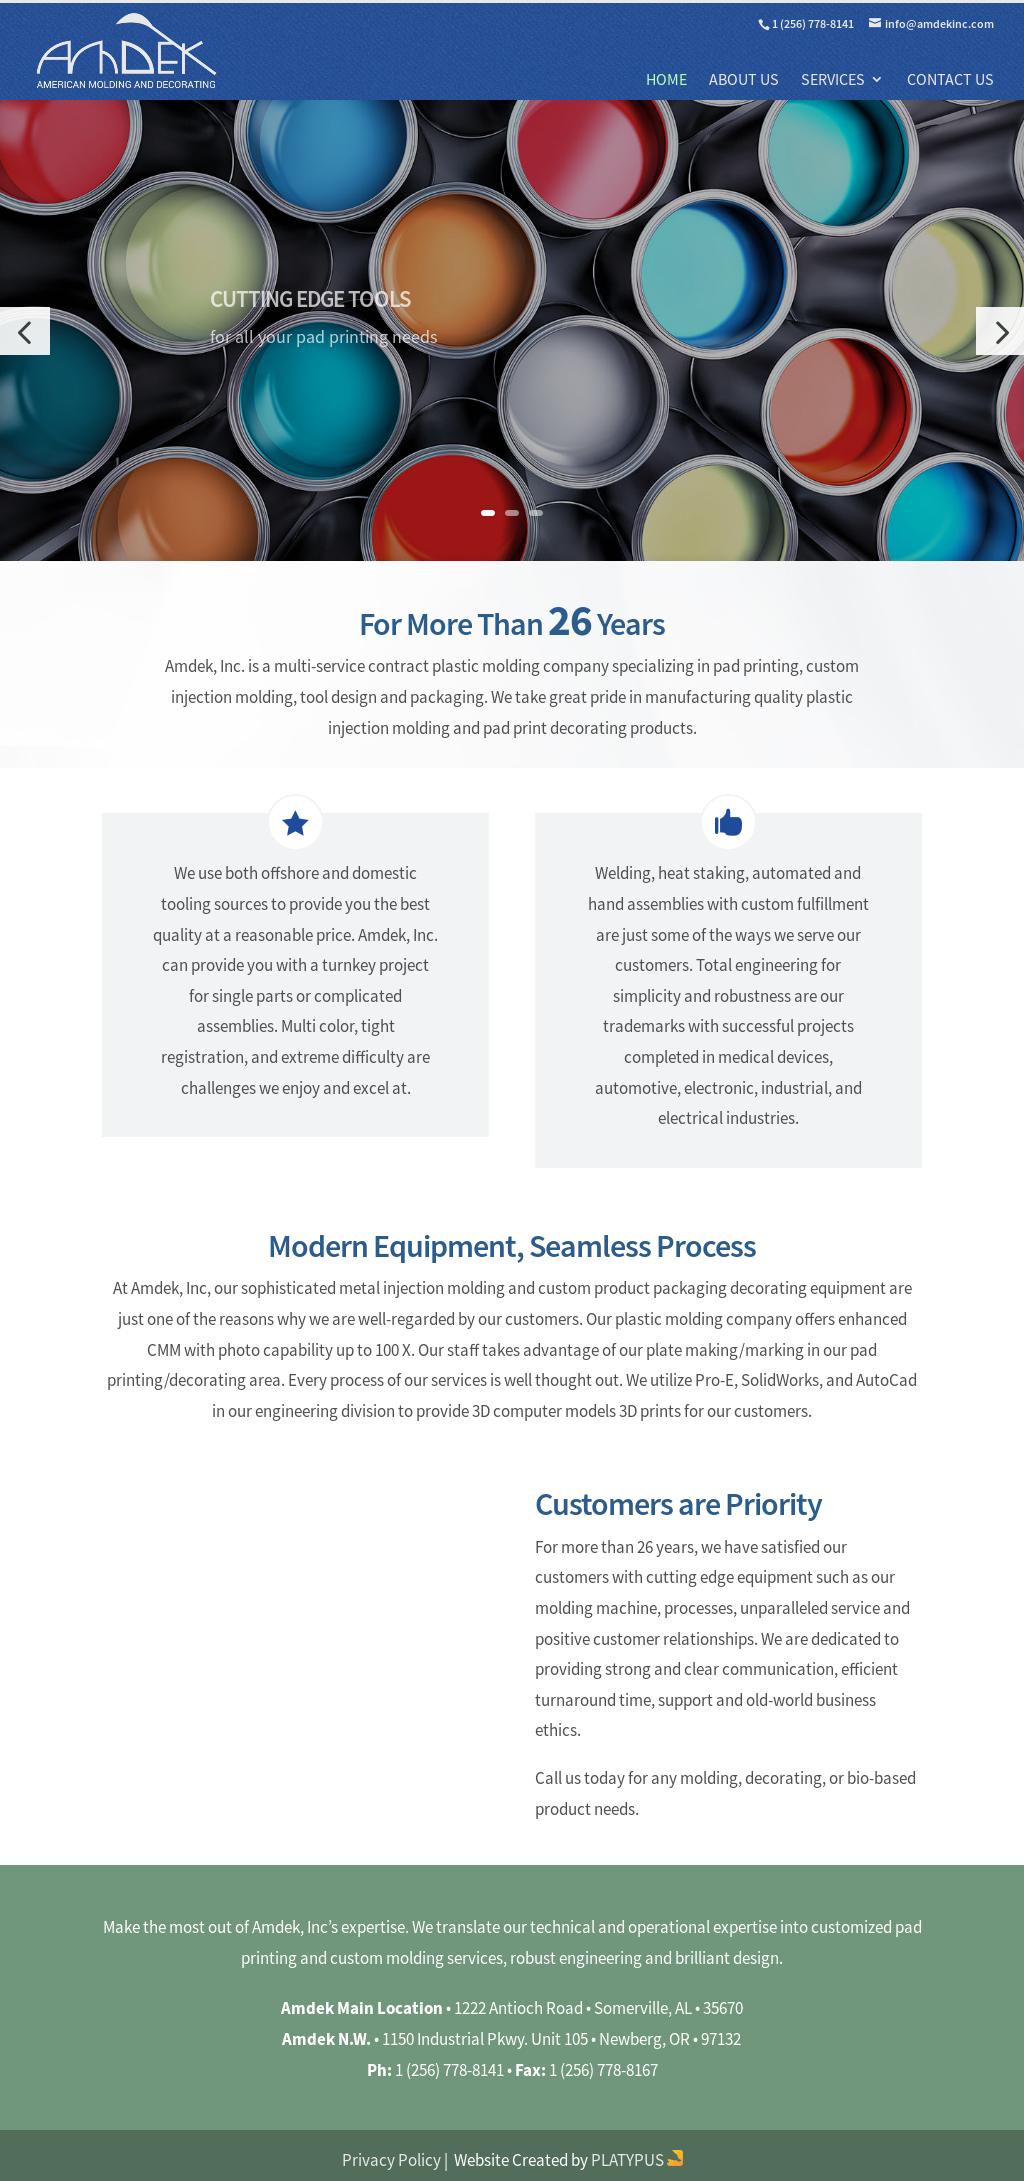 Amdek Competitors, Revenue and Employees - Owler Company Profile